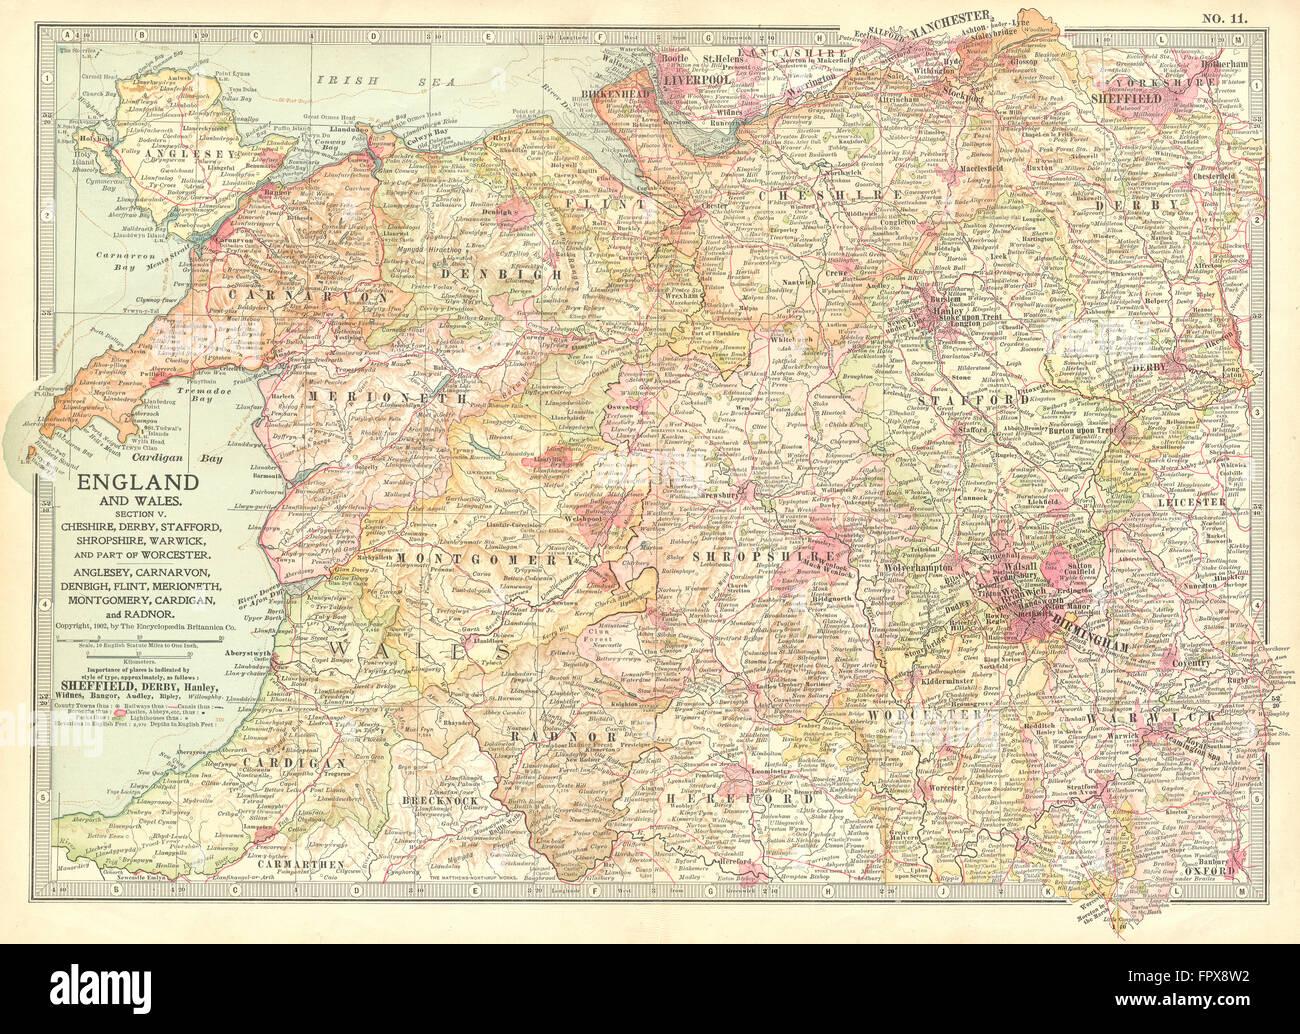 uk west midlands england north wales 1903 antique map